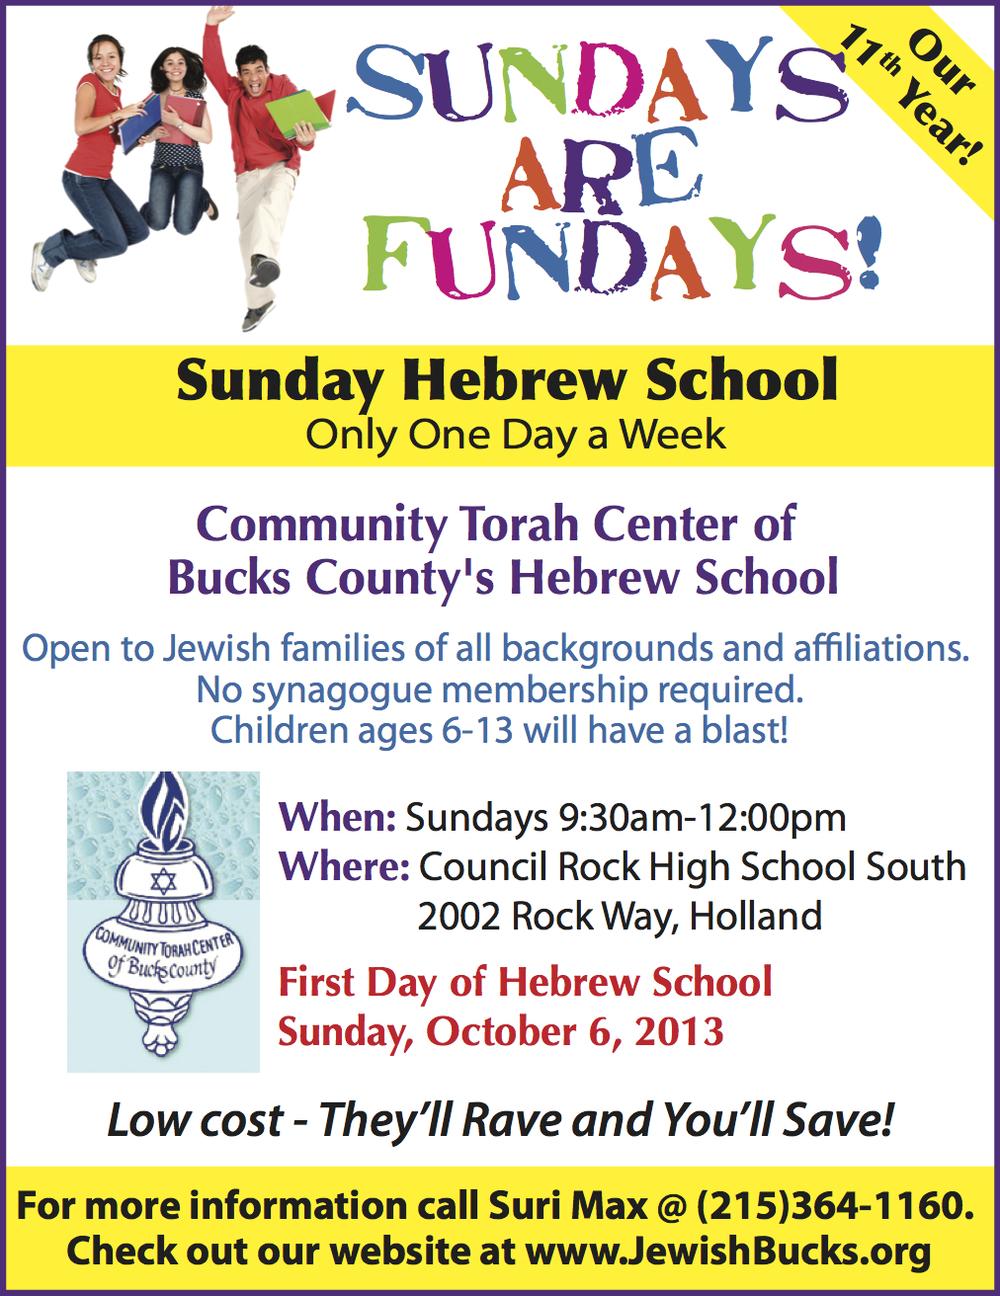 Community_Torah_Center_August_13_proof.jpg